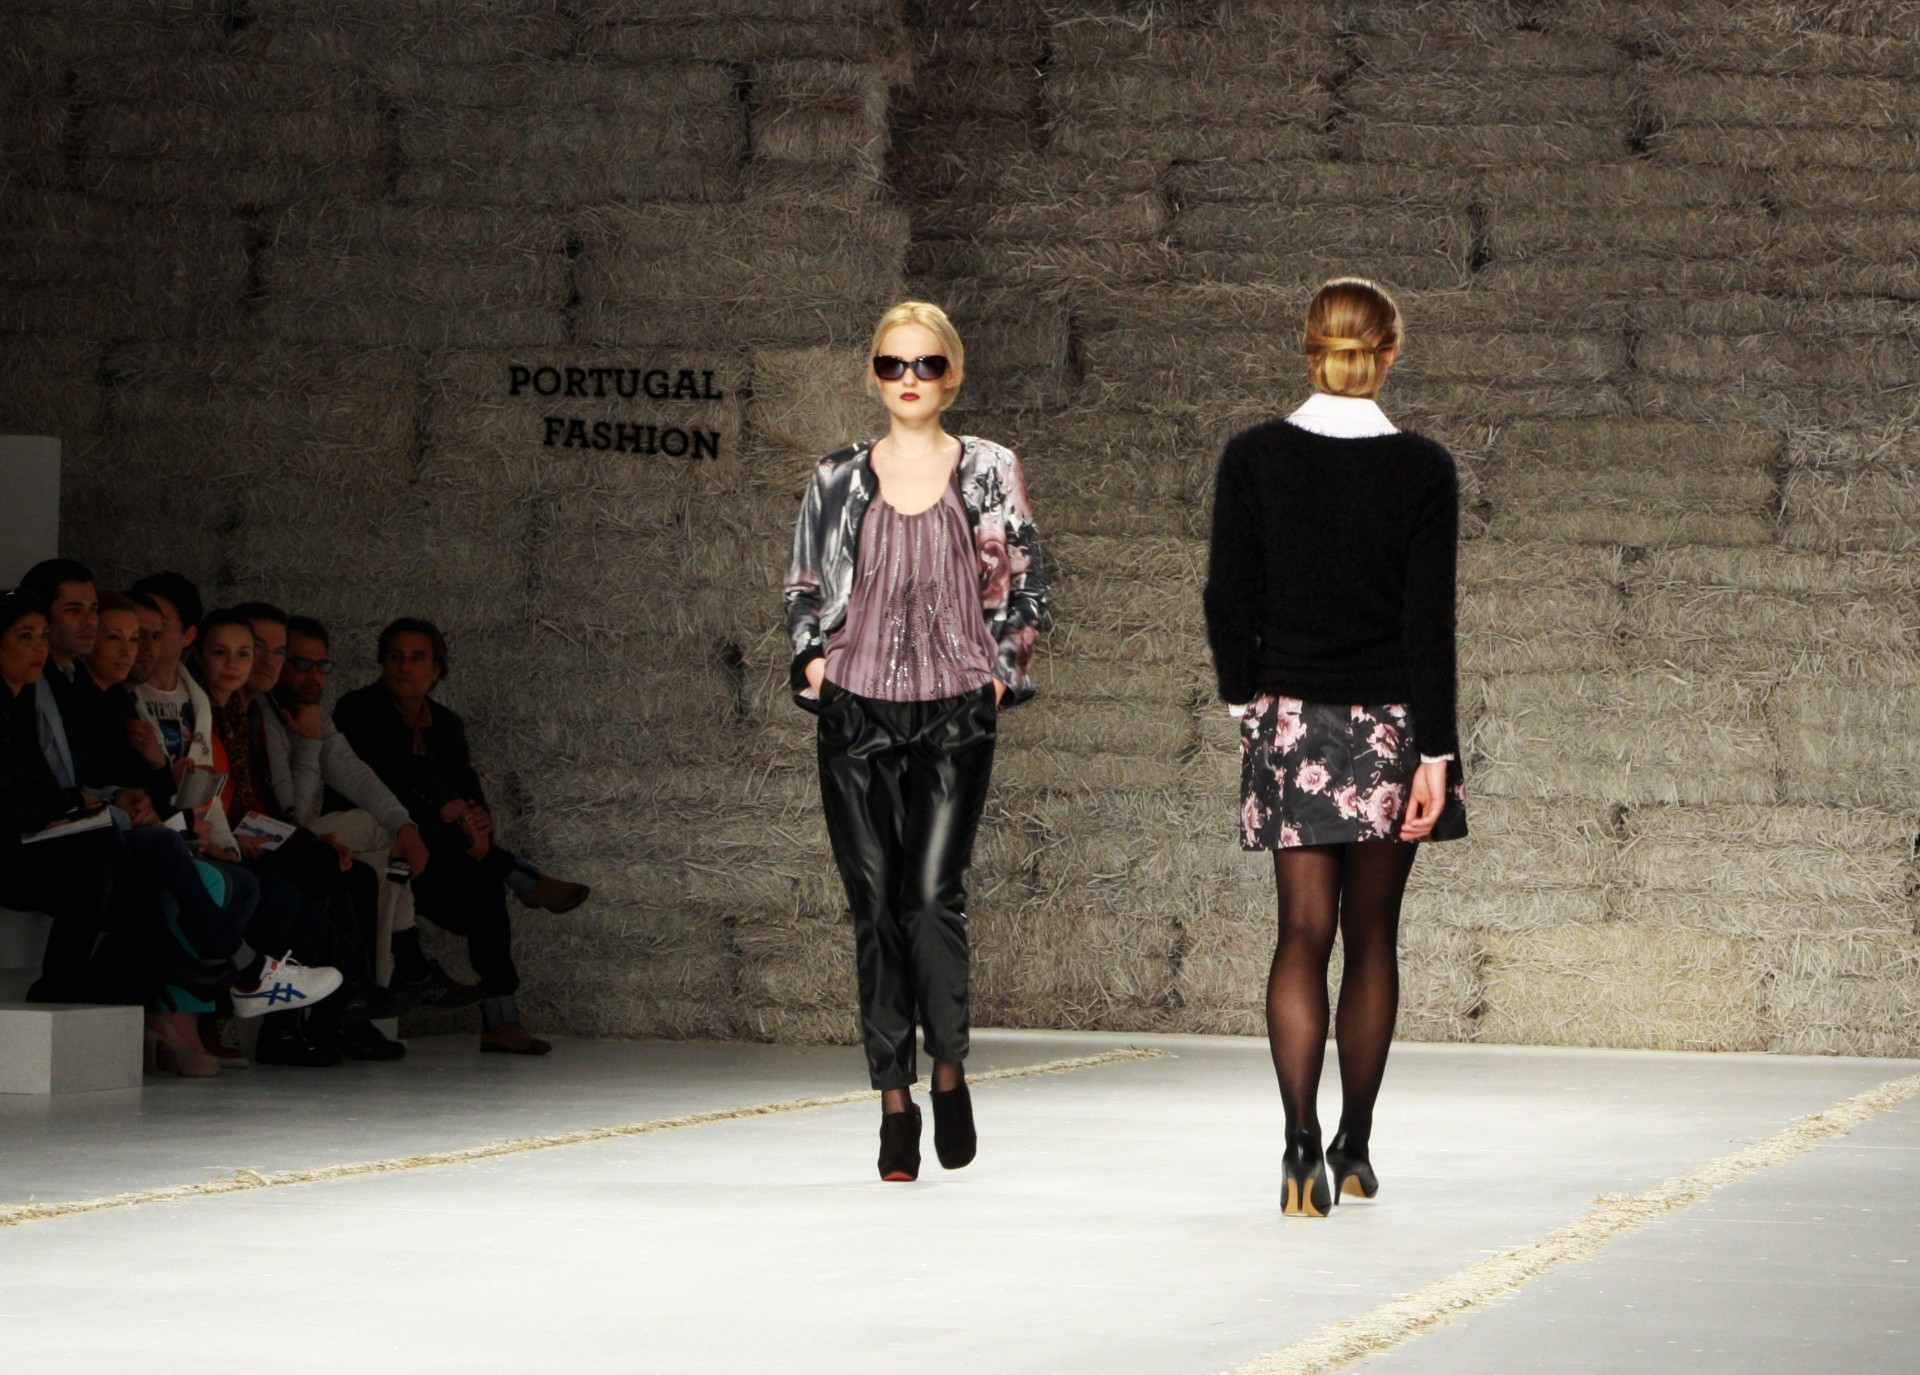 Portuguese Fashion Designers Sell Clothing Pieces To Help Mozambique portuguese fashion designers Portuguese Fashion Designers Sell Clothing Pieces To Help Mozambique BALLENTINA